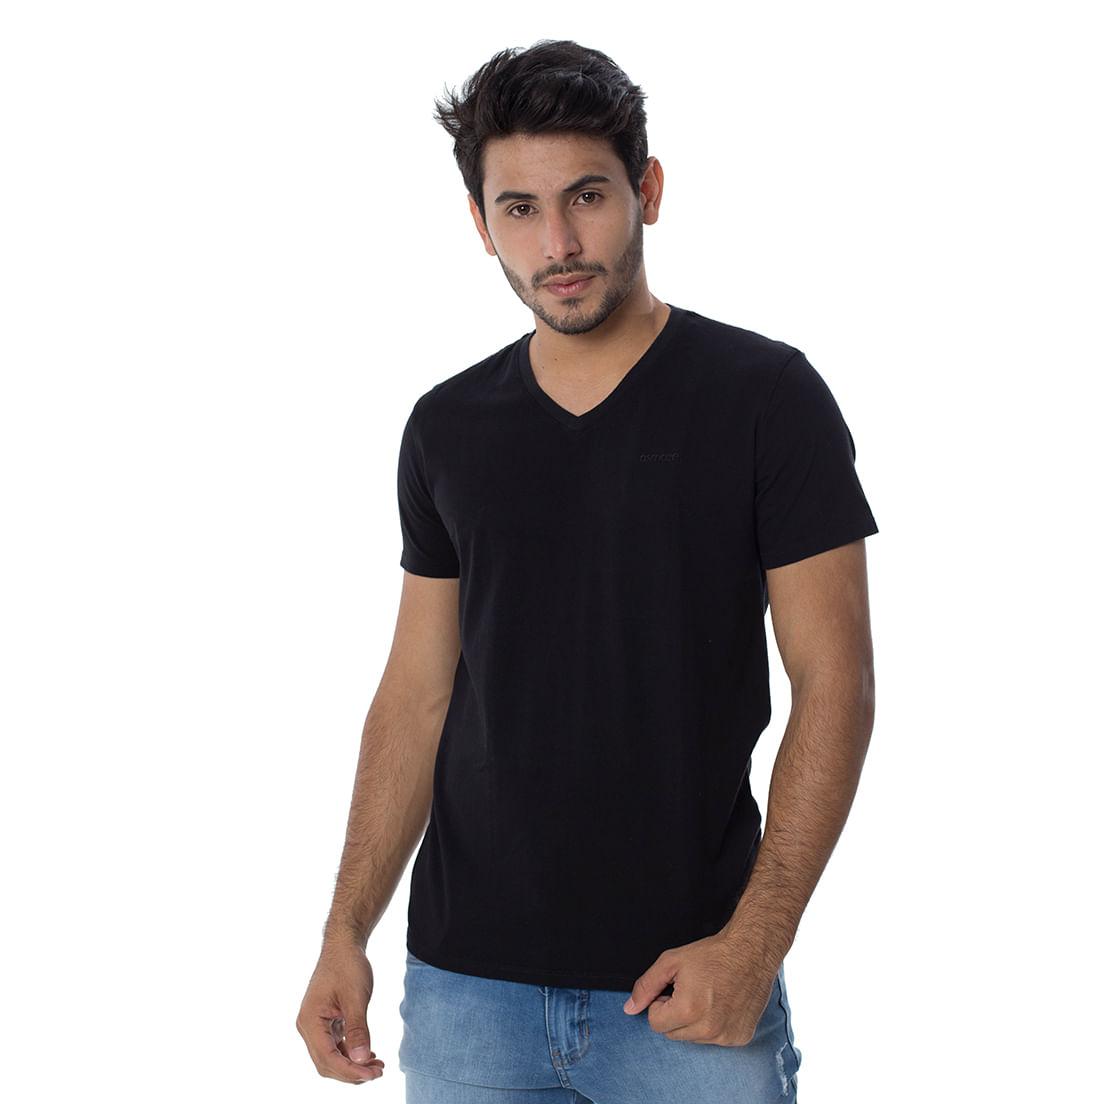 Camiseta Osmoze Gola V Z 110112807 Preto